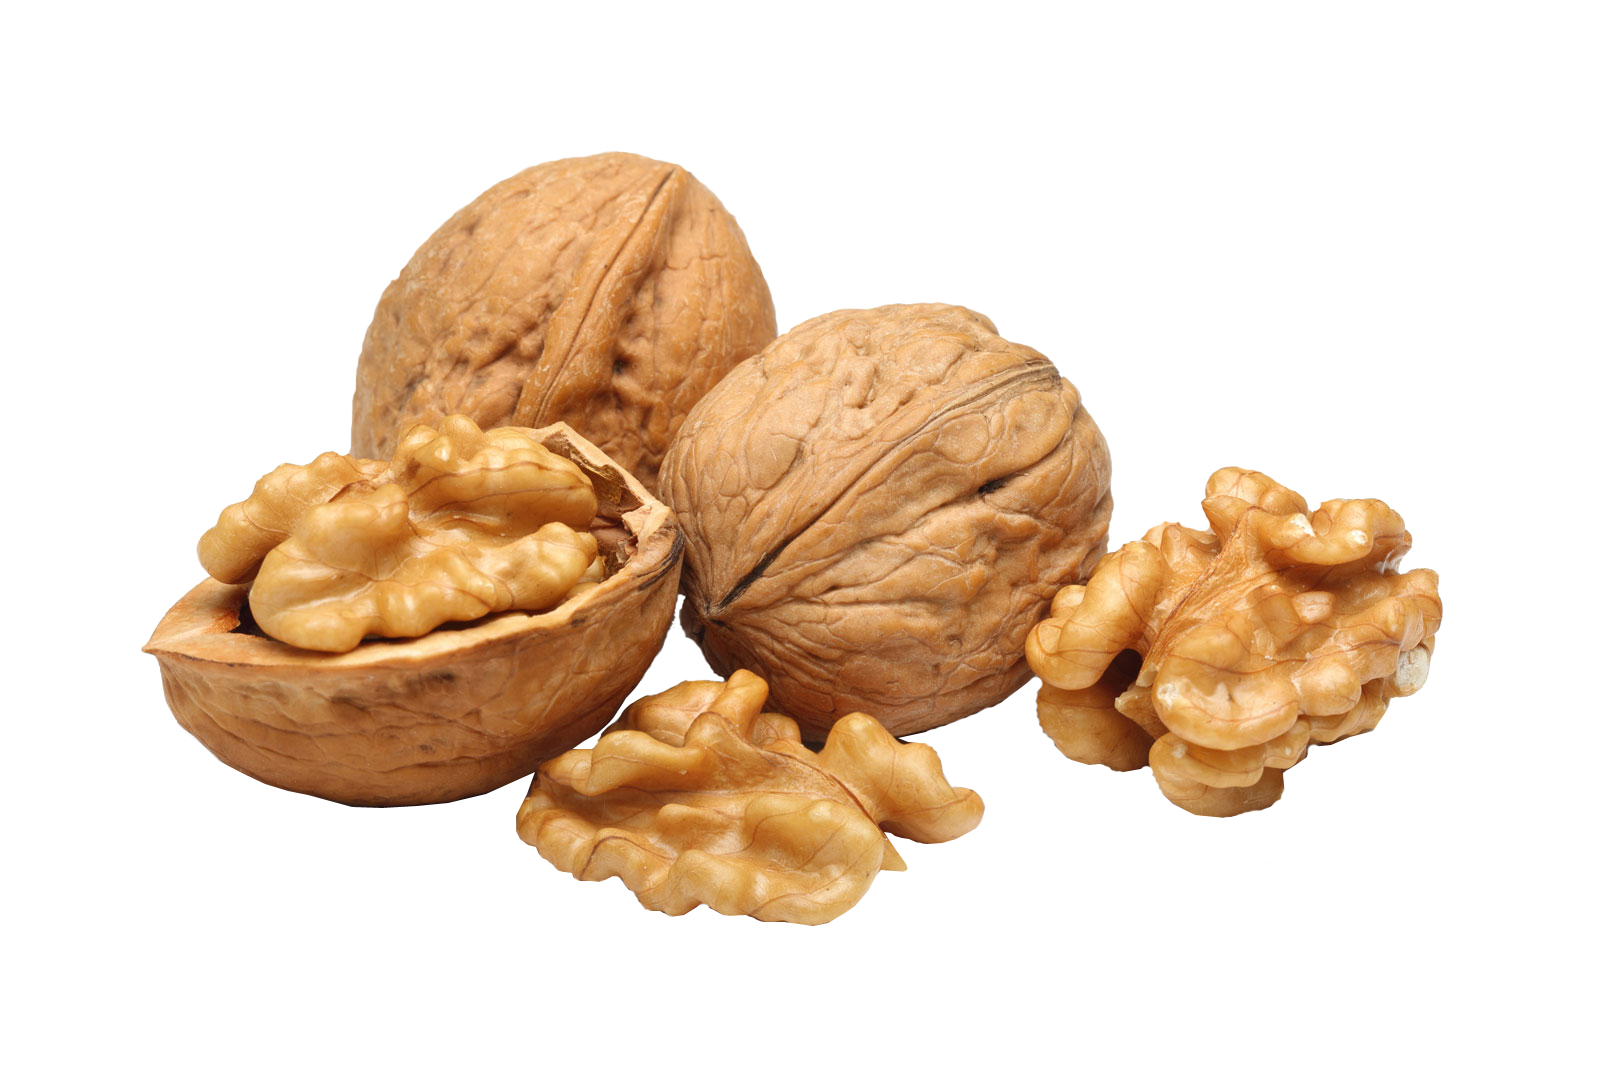 Walnut png image purepng. Peanuts clipart transparent background